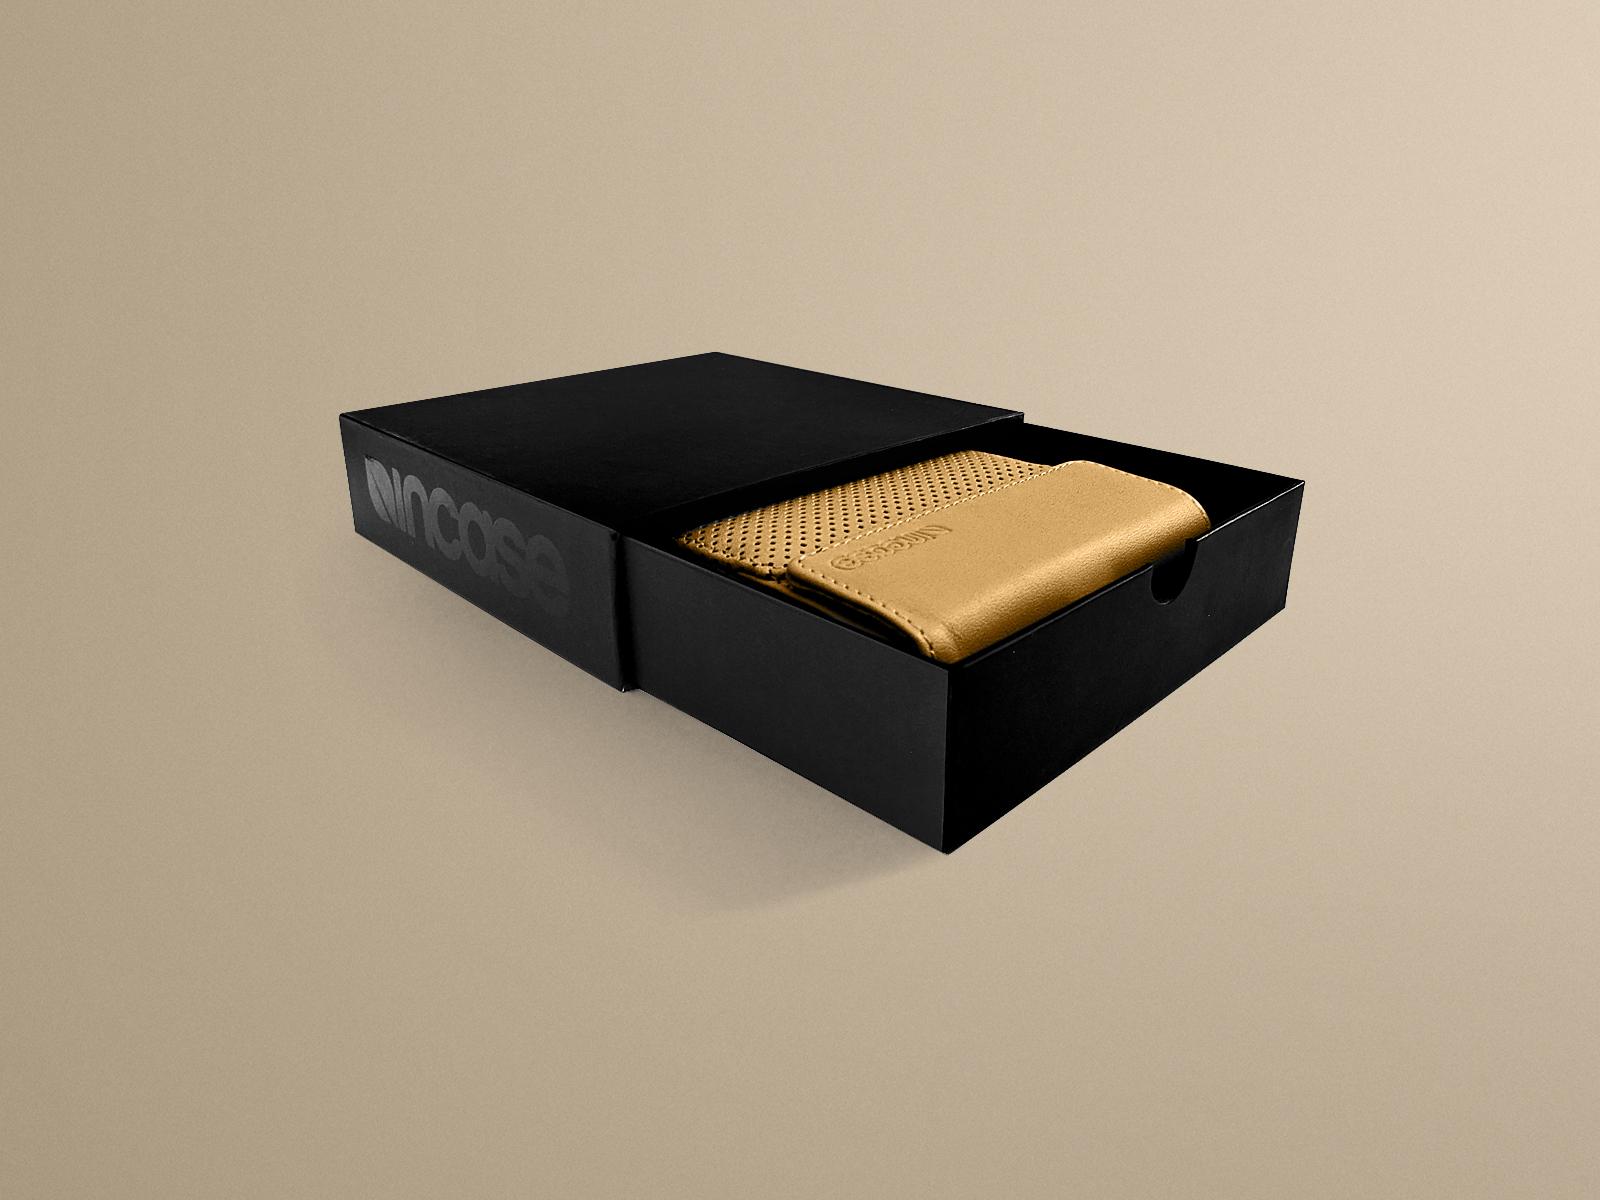 incase-LuxBox-open-1600x1000-rev2019.jpg